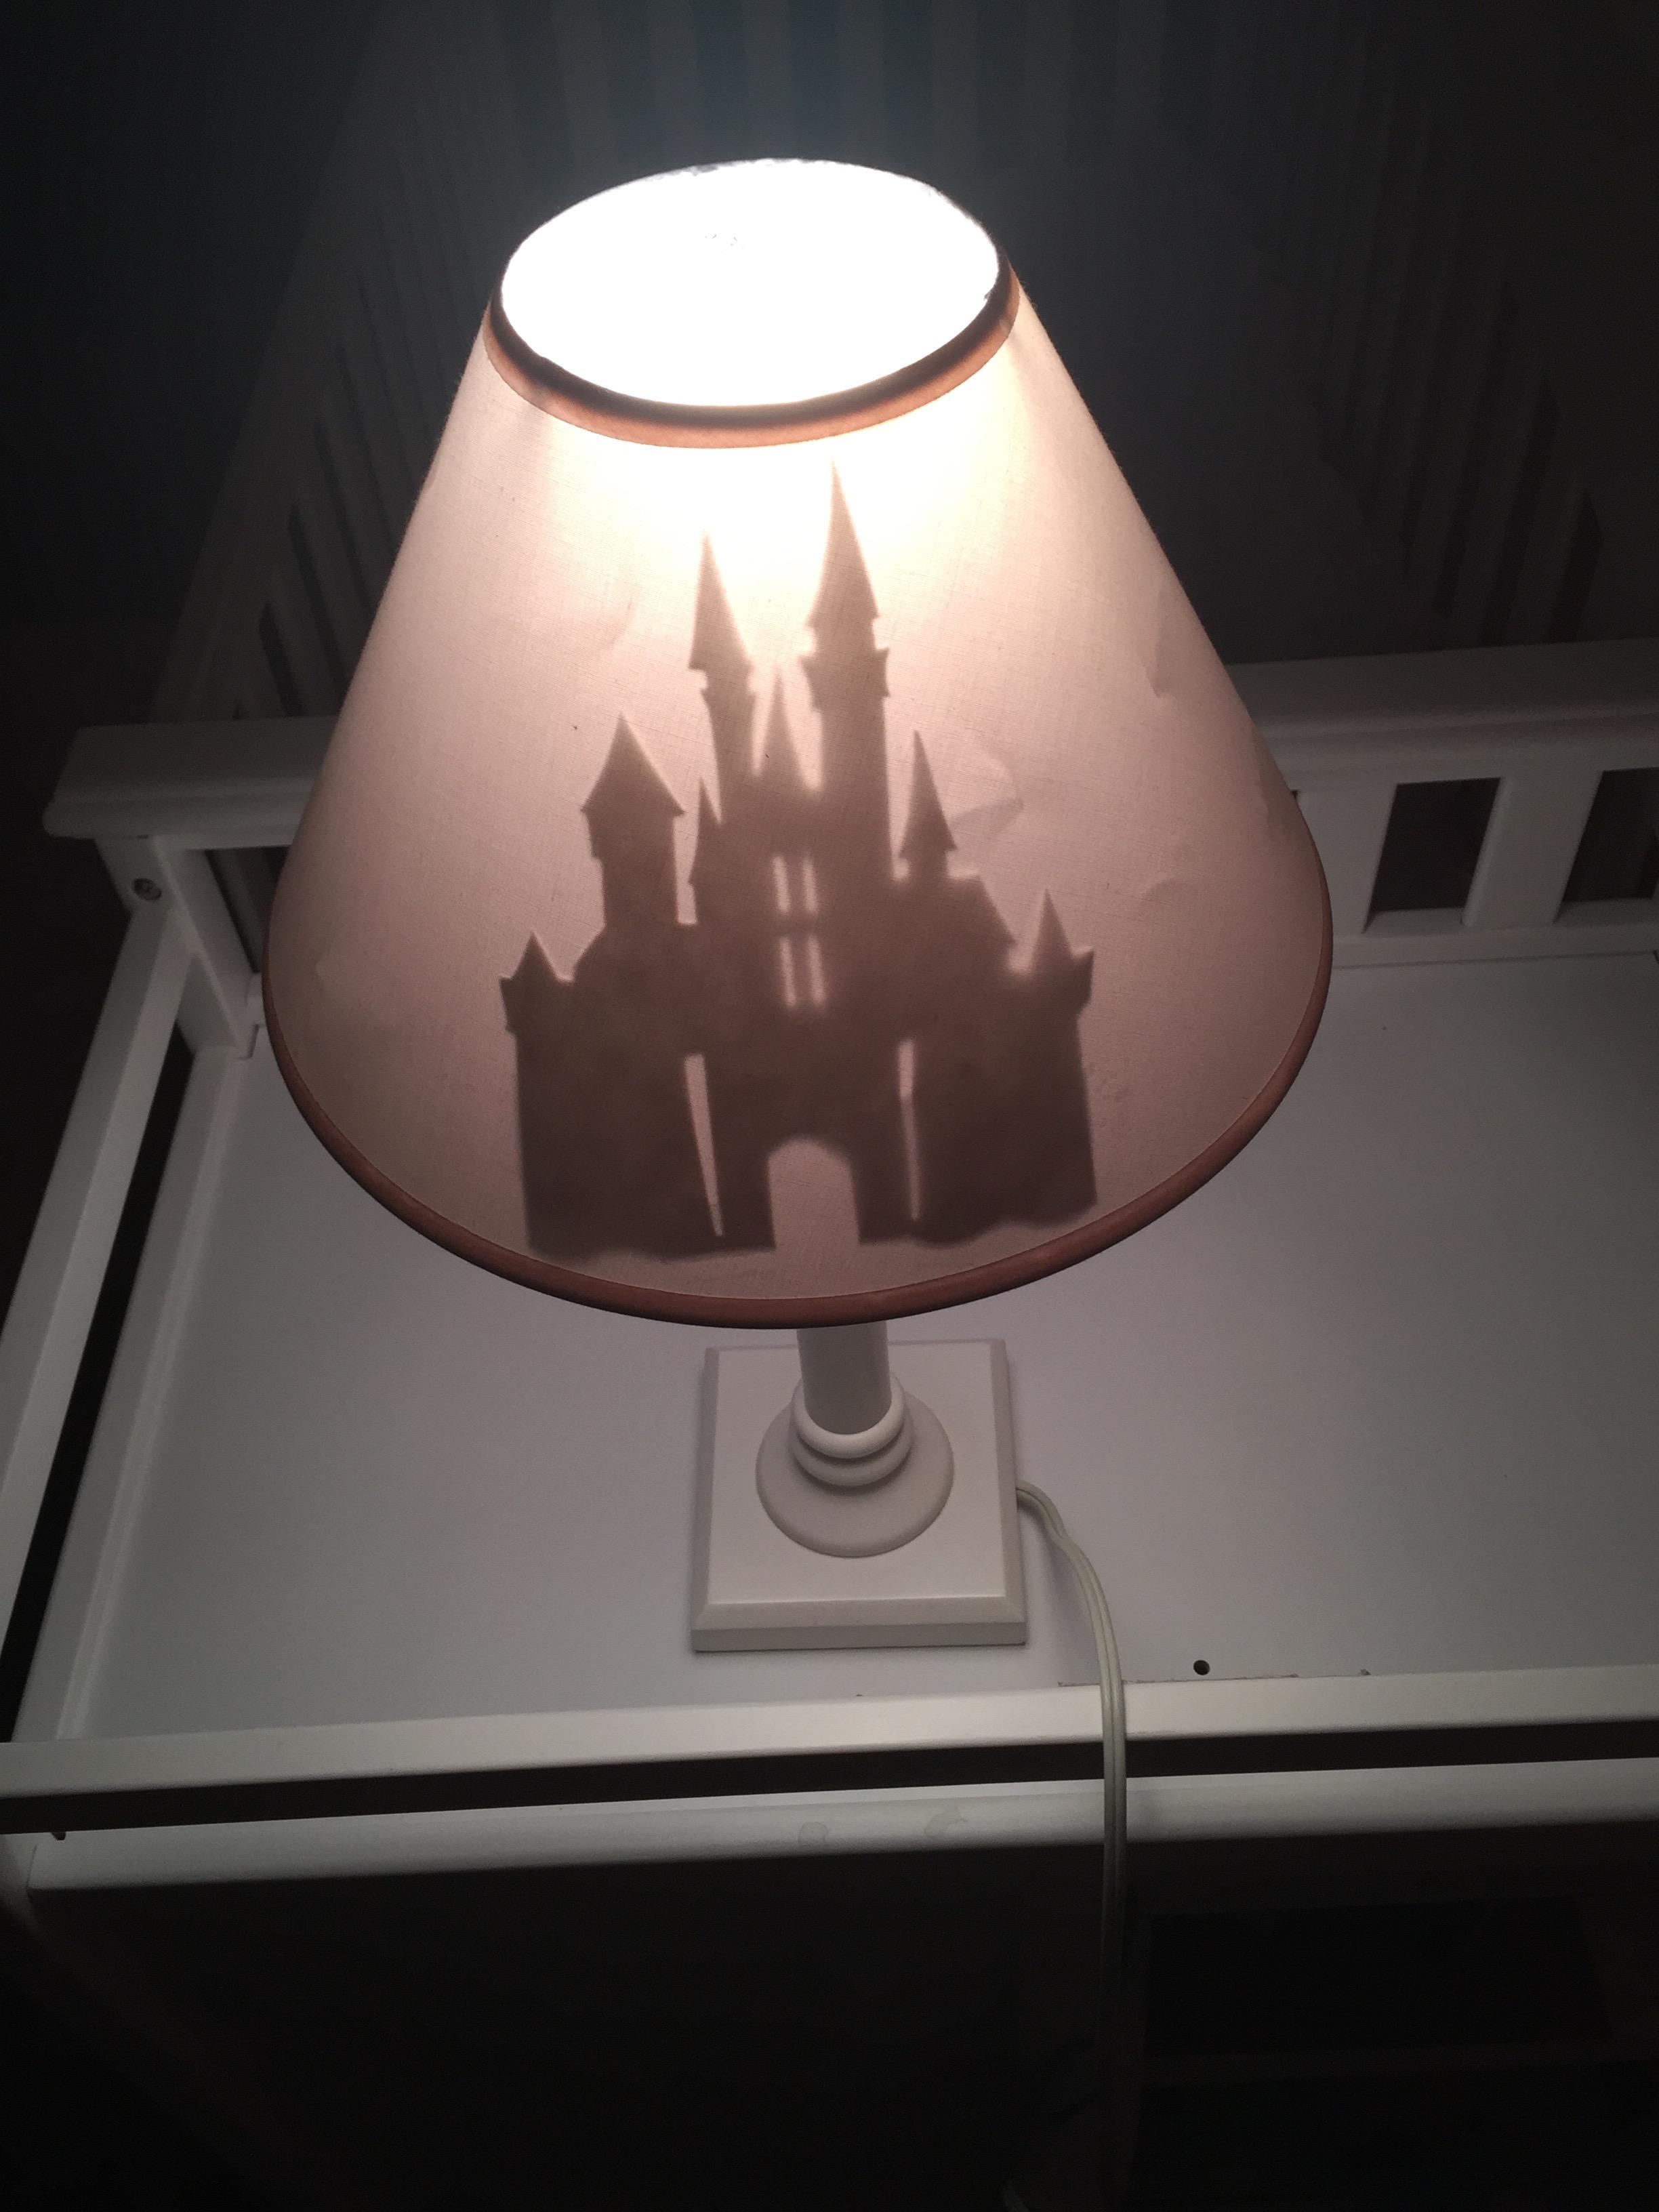 Diy Disney Lamp Shade Touringplans Com Blog